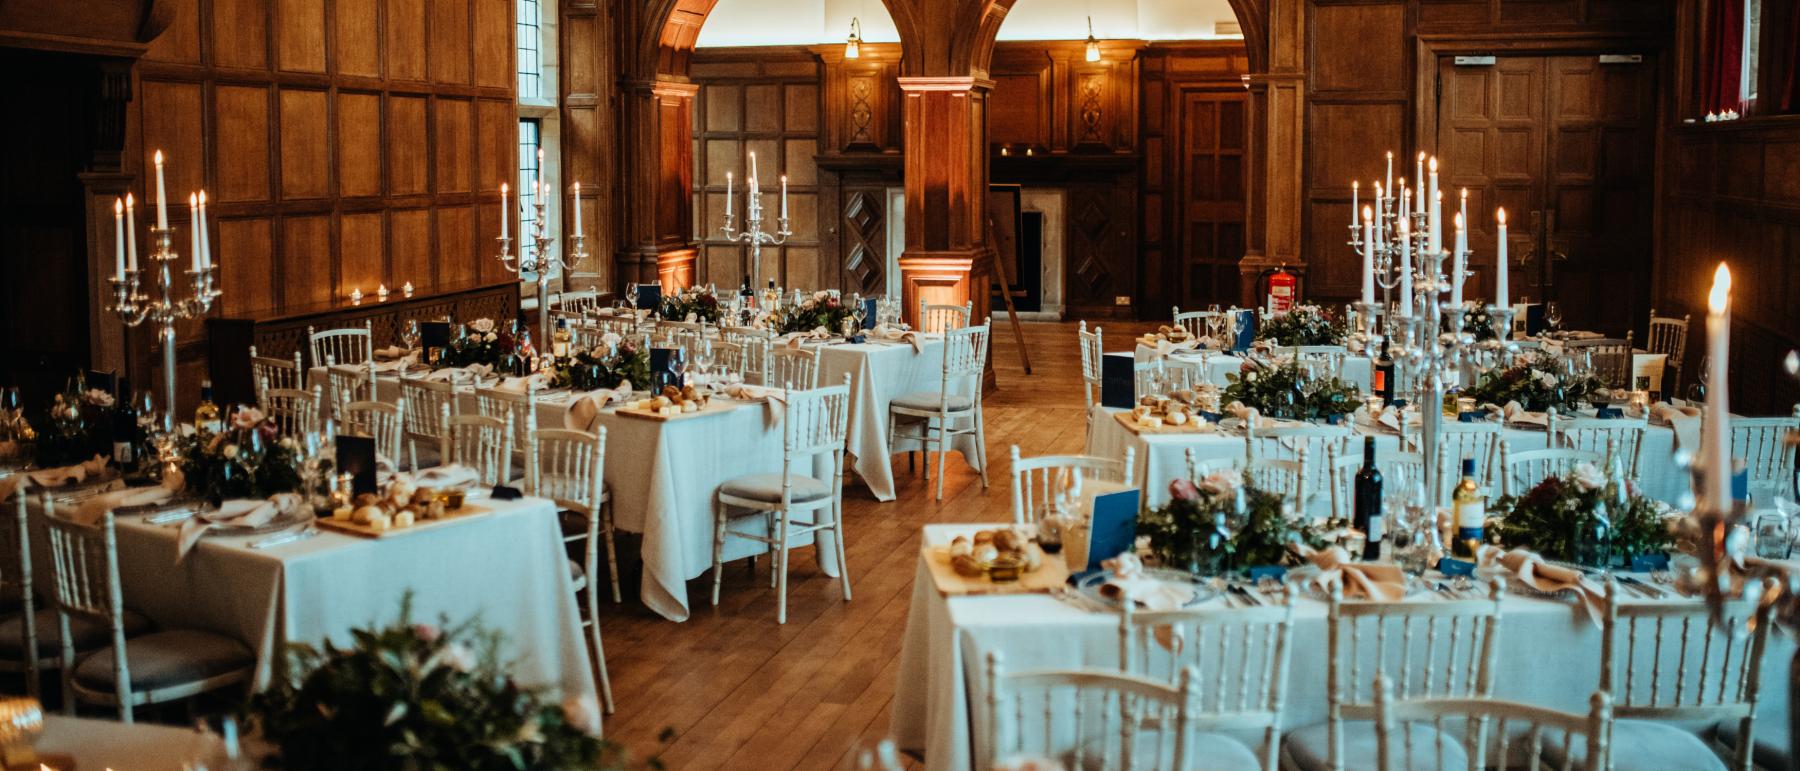 Wedding tables arranged in a chevron shape